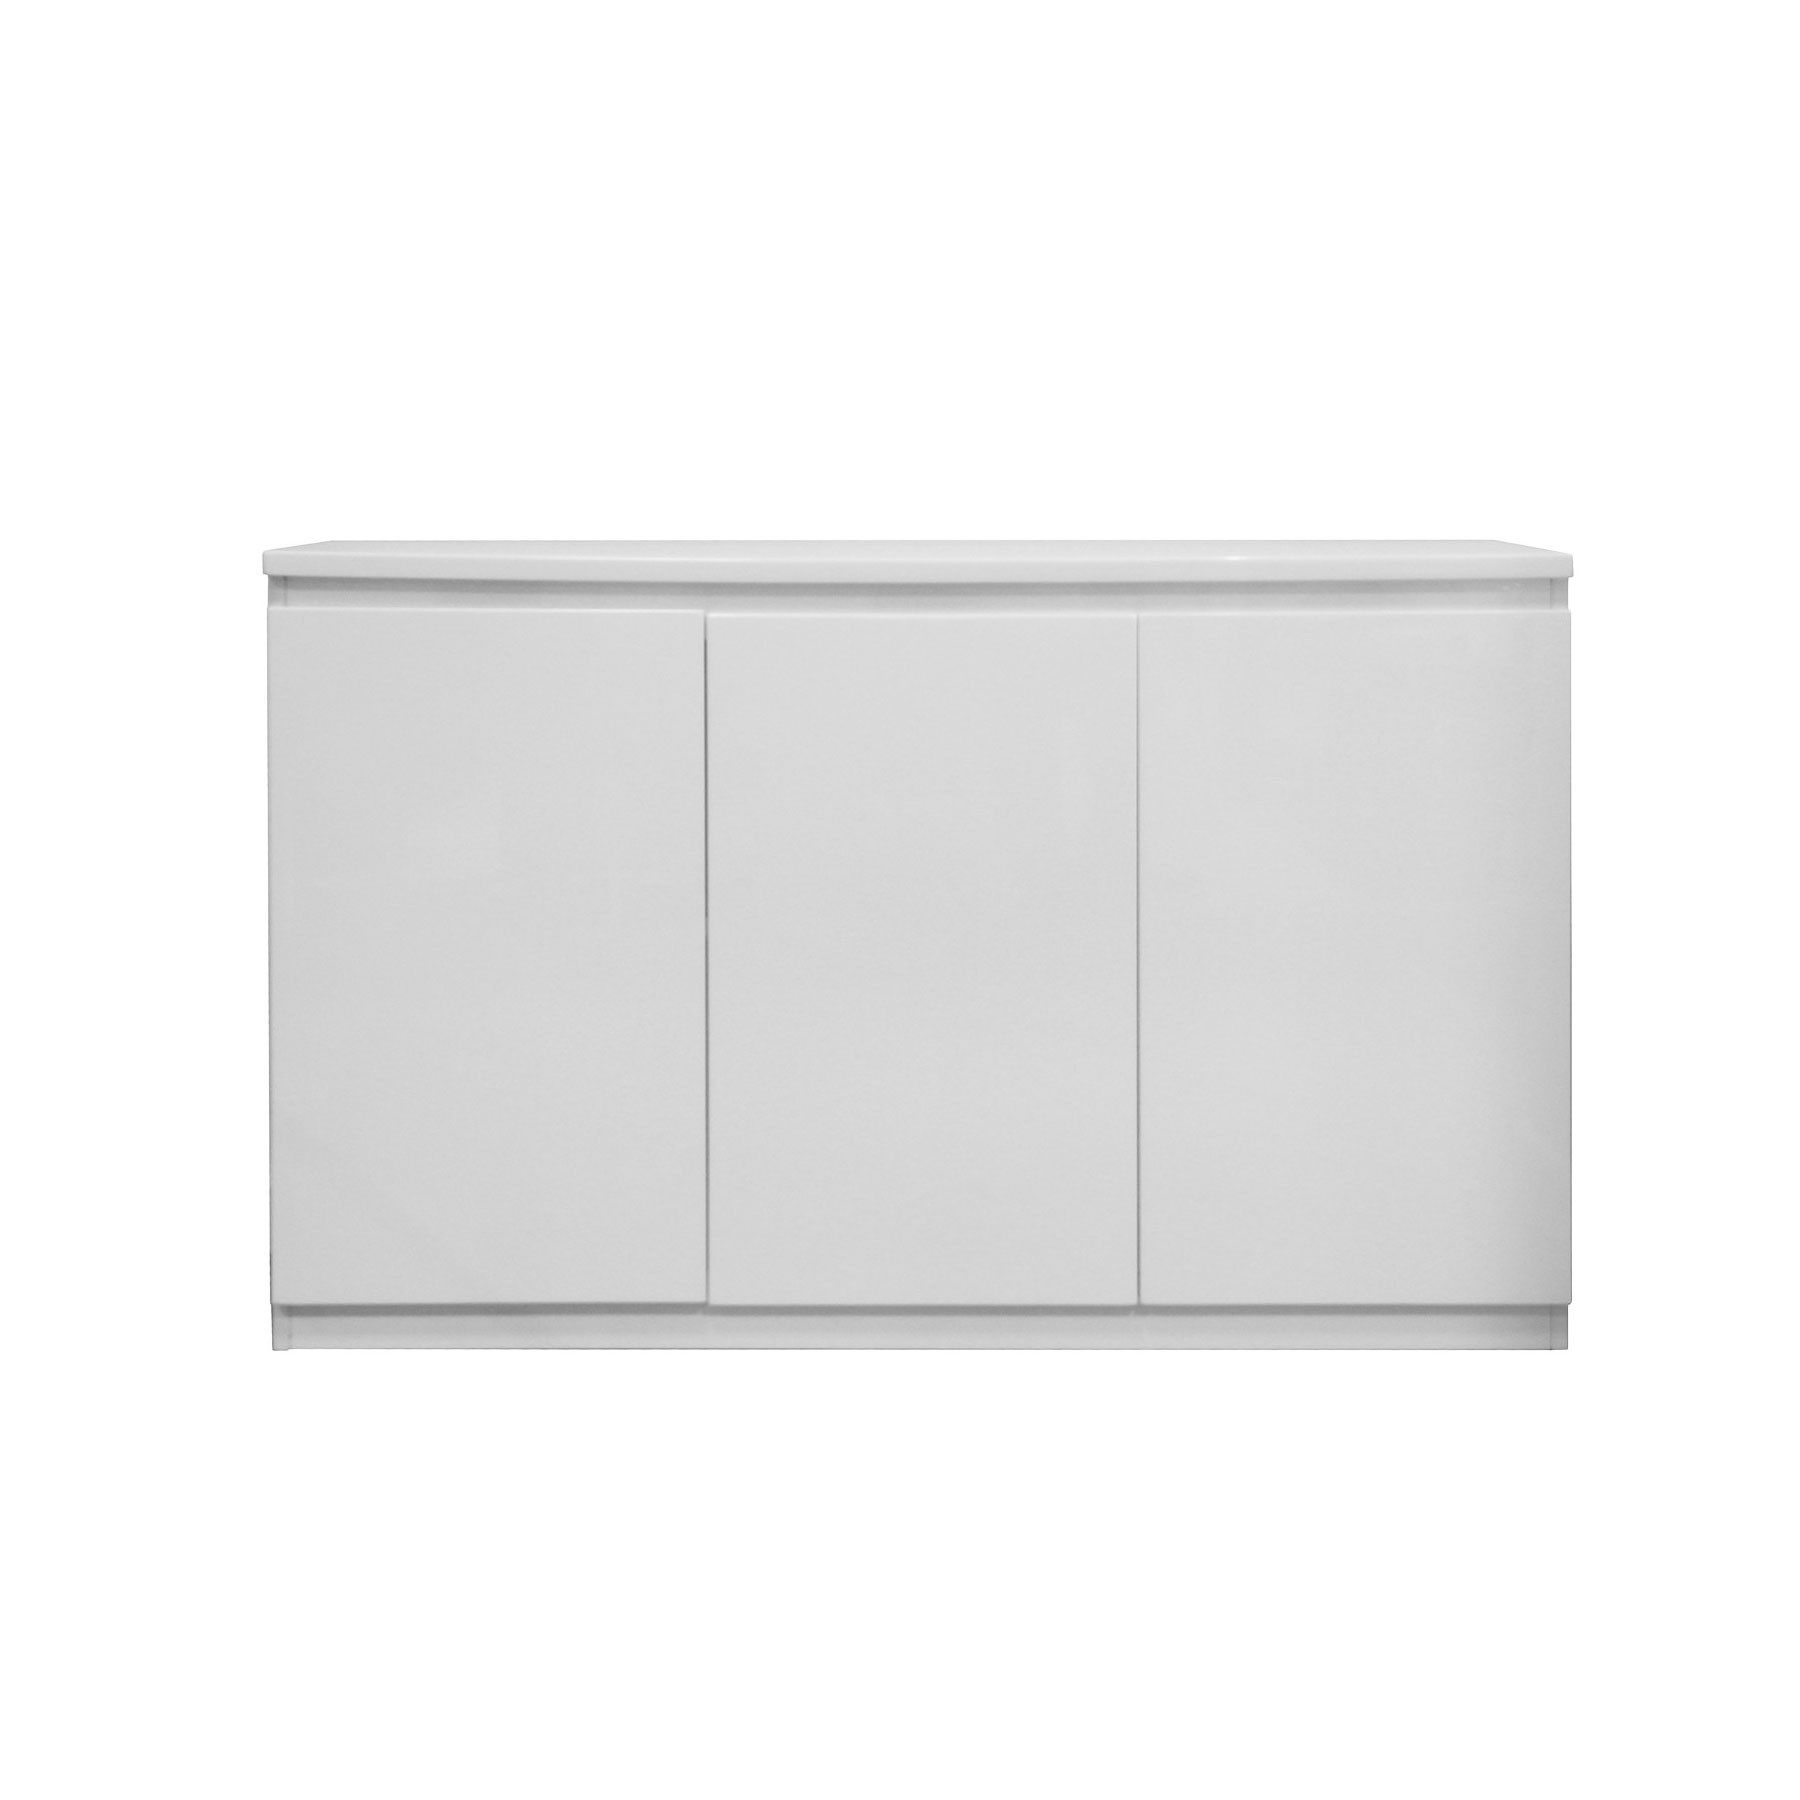 Vigo High Gloss White 3 Door Sideboard with White Wash 3-Door 3-Drawer Sideboards (Image 26 of 30)